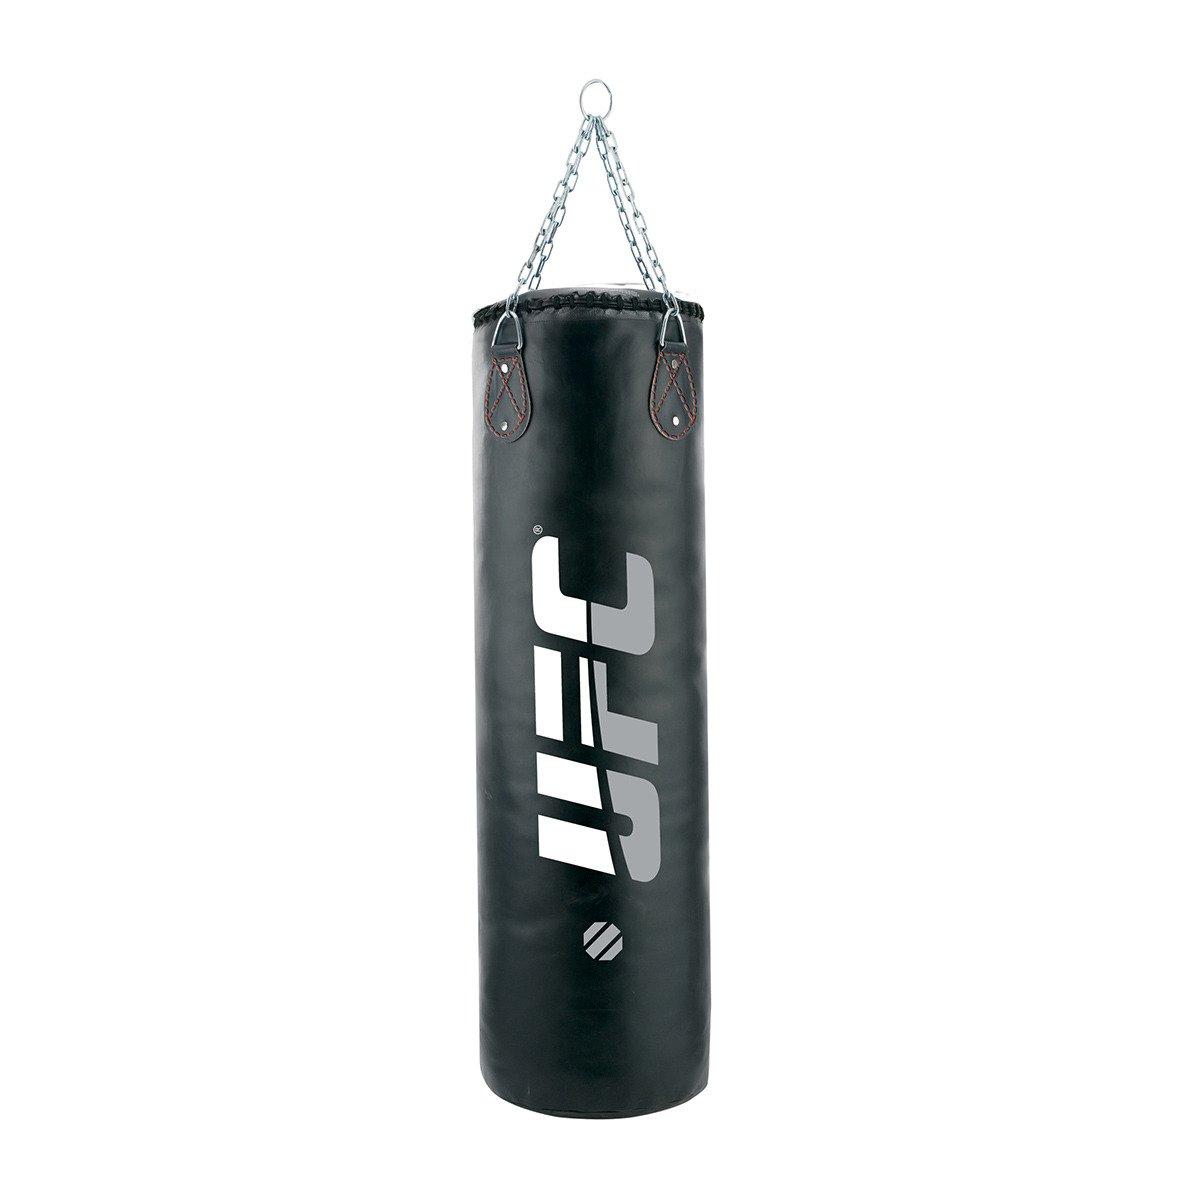 UFC® 100 lb. Polyurethane Professional Oversize Heavy Bag